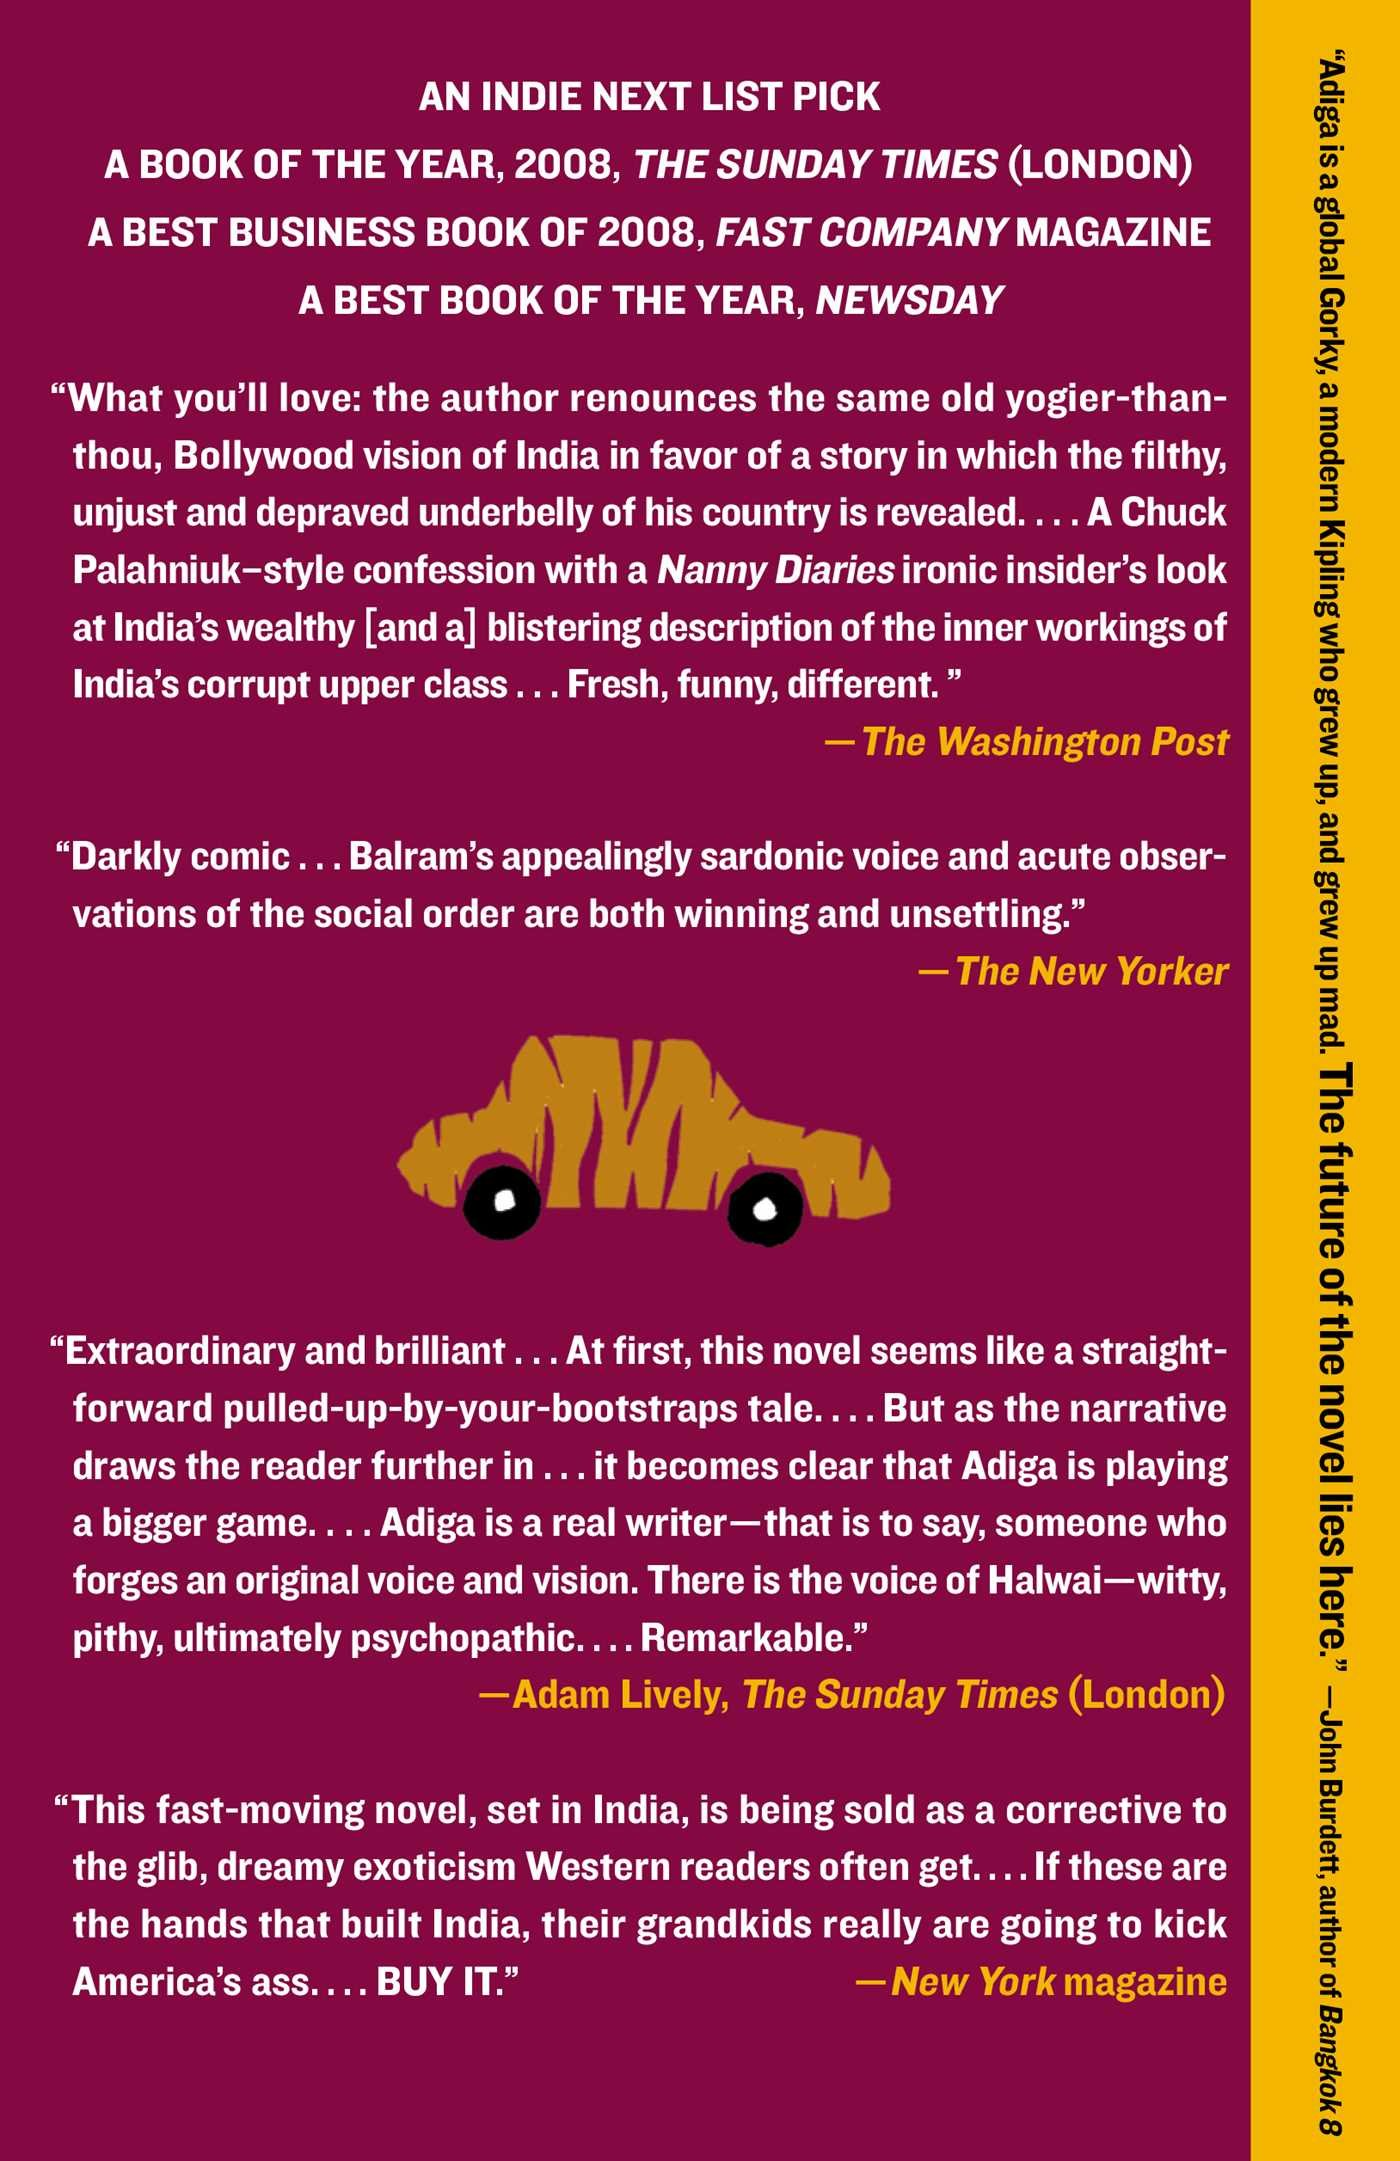 Amazoncom The White Tiger A Novel Aravind - Quick tutorial reveals how to make ordinary photos look extraordinary